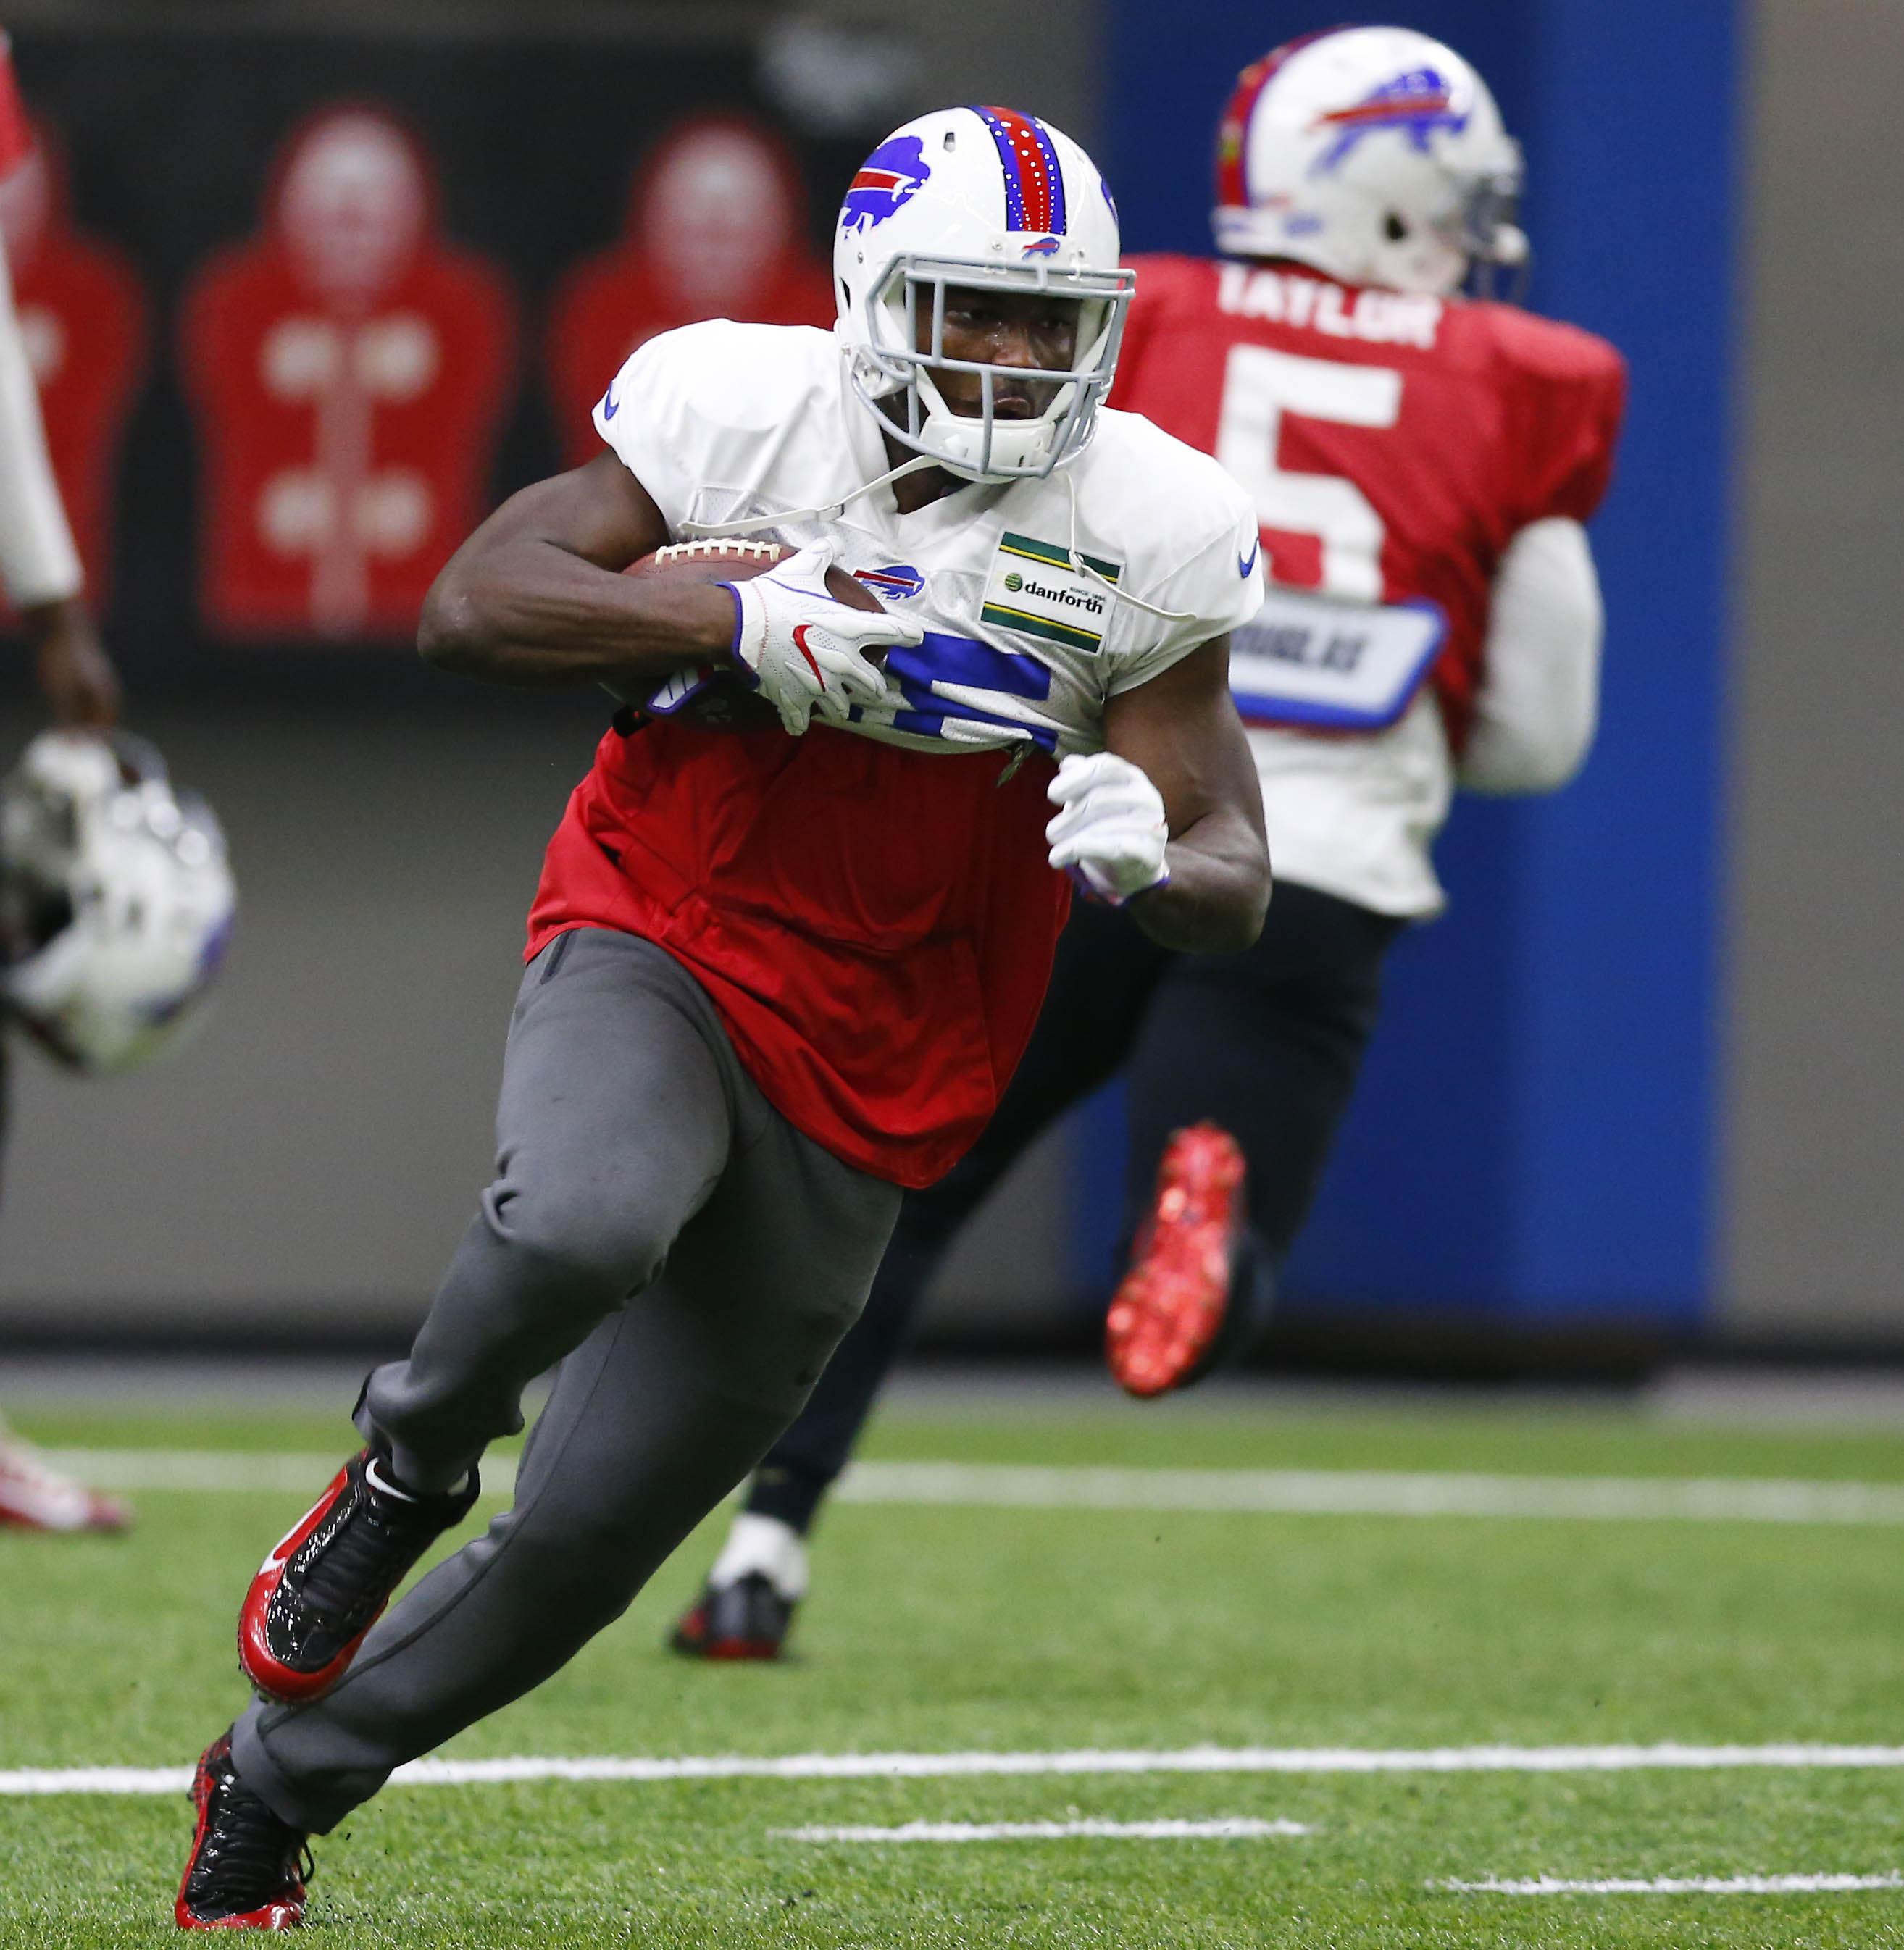 Buffalo Bills running back LeSean McCoy during offseason workouts. (Mark Mulville/Buffalo News)